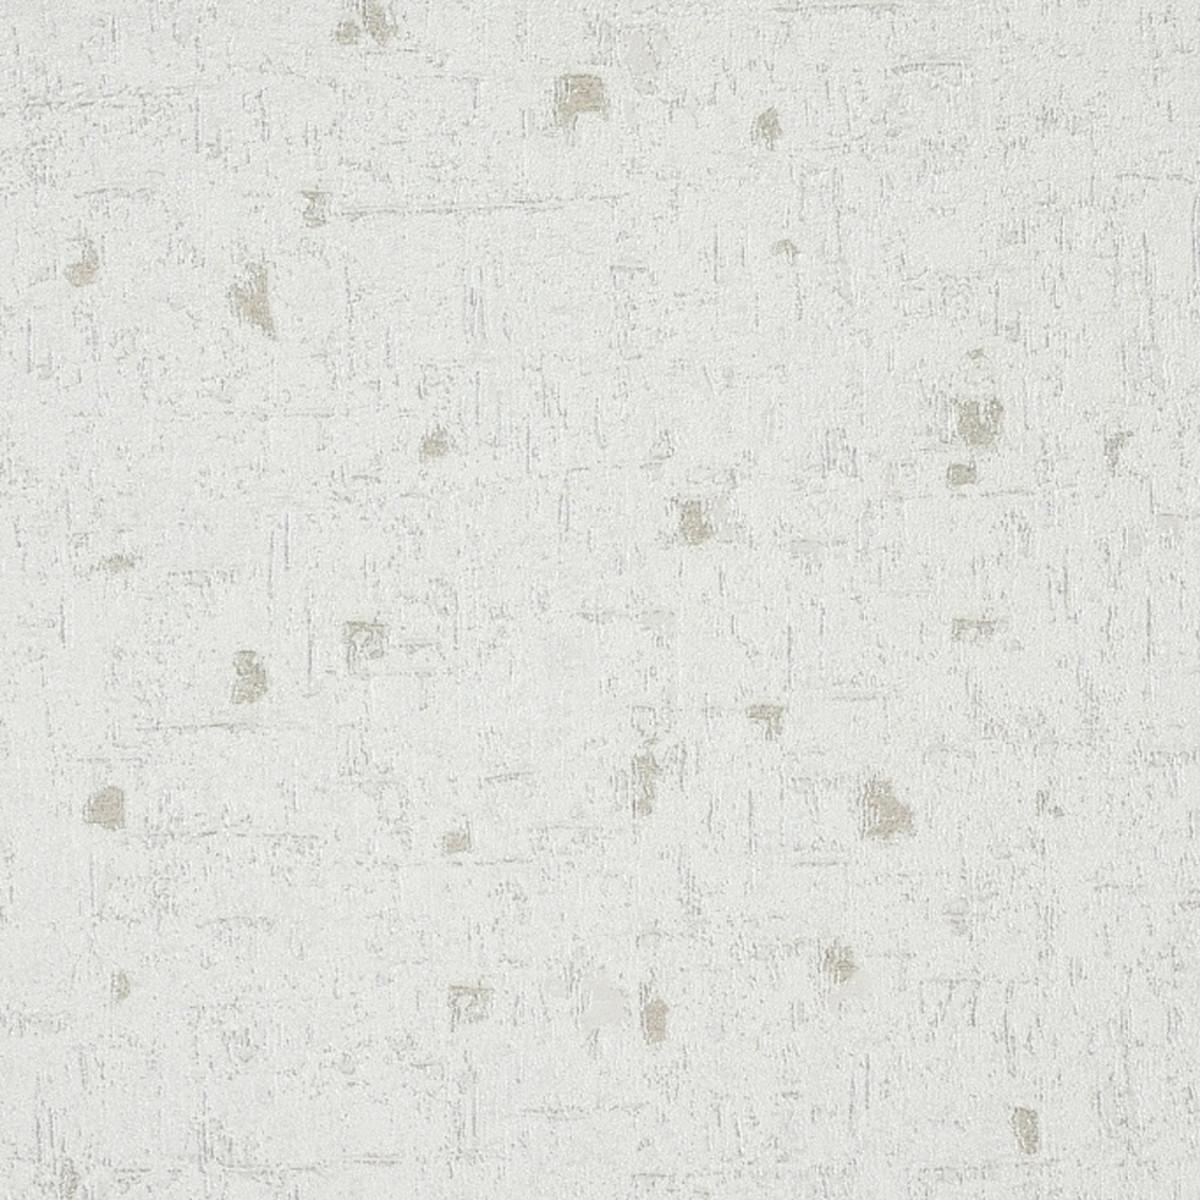 Обои флизелиновые Артекс Freedom белые 1.06 м 10169-01